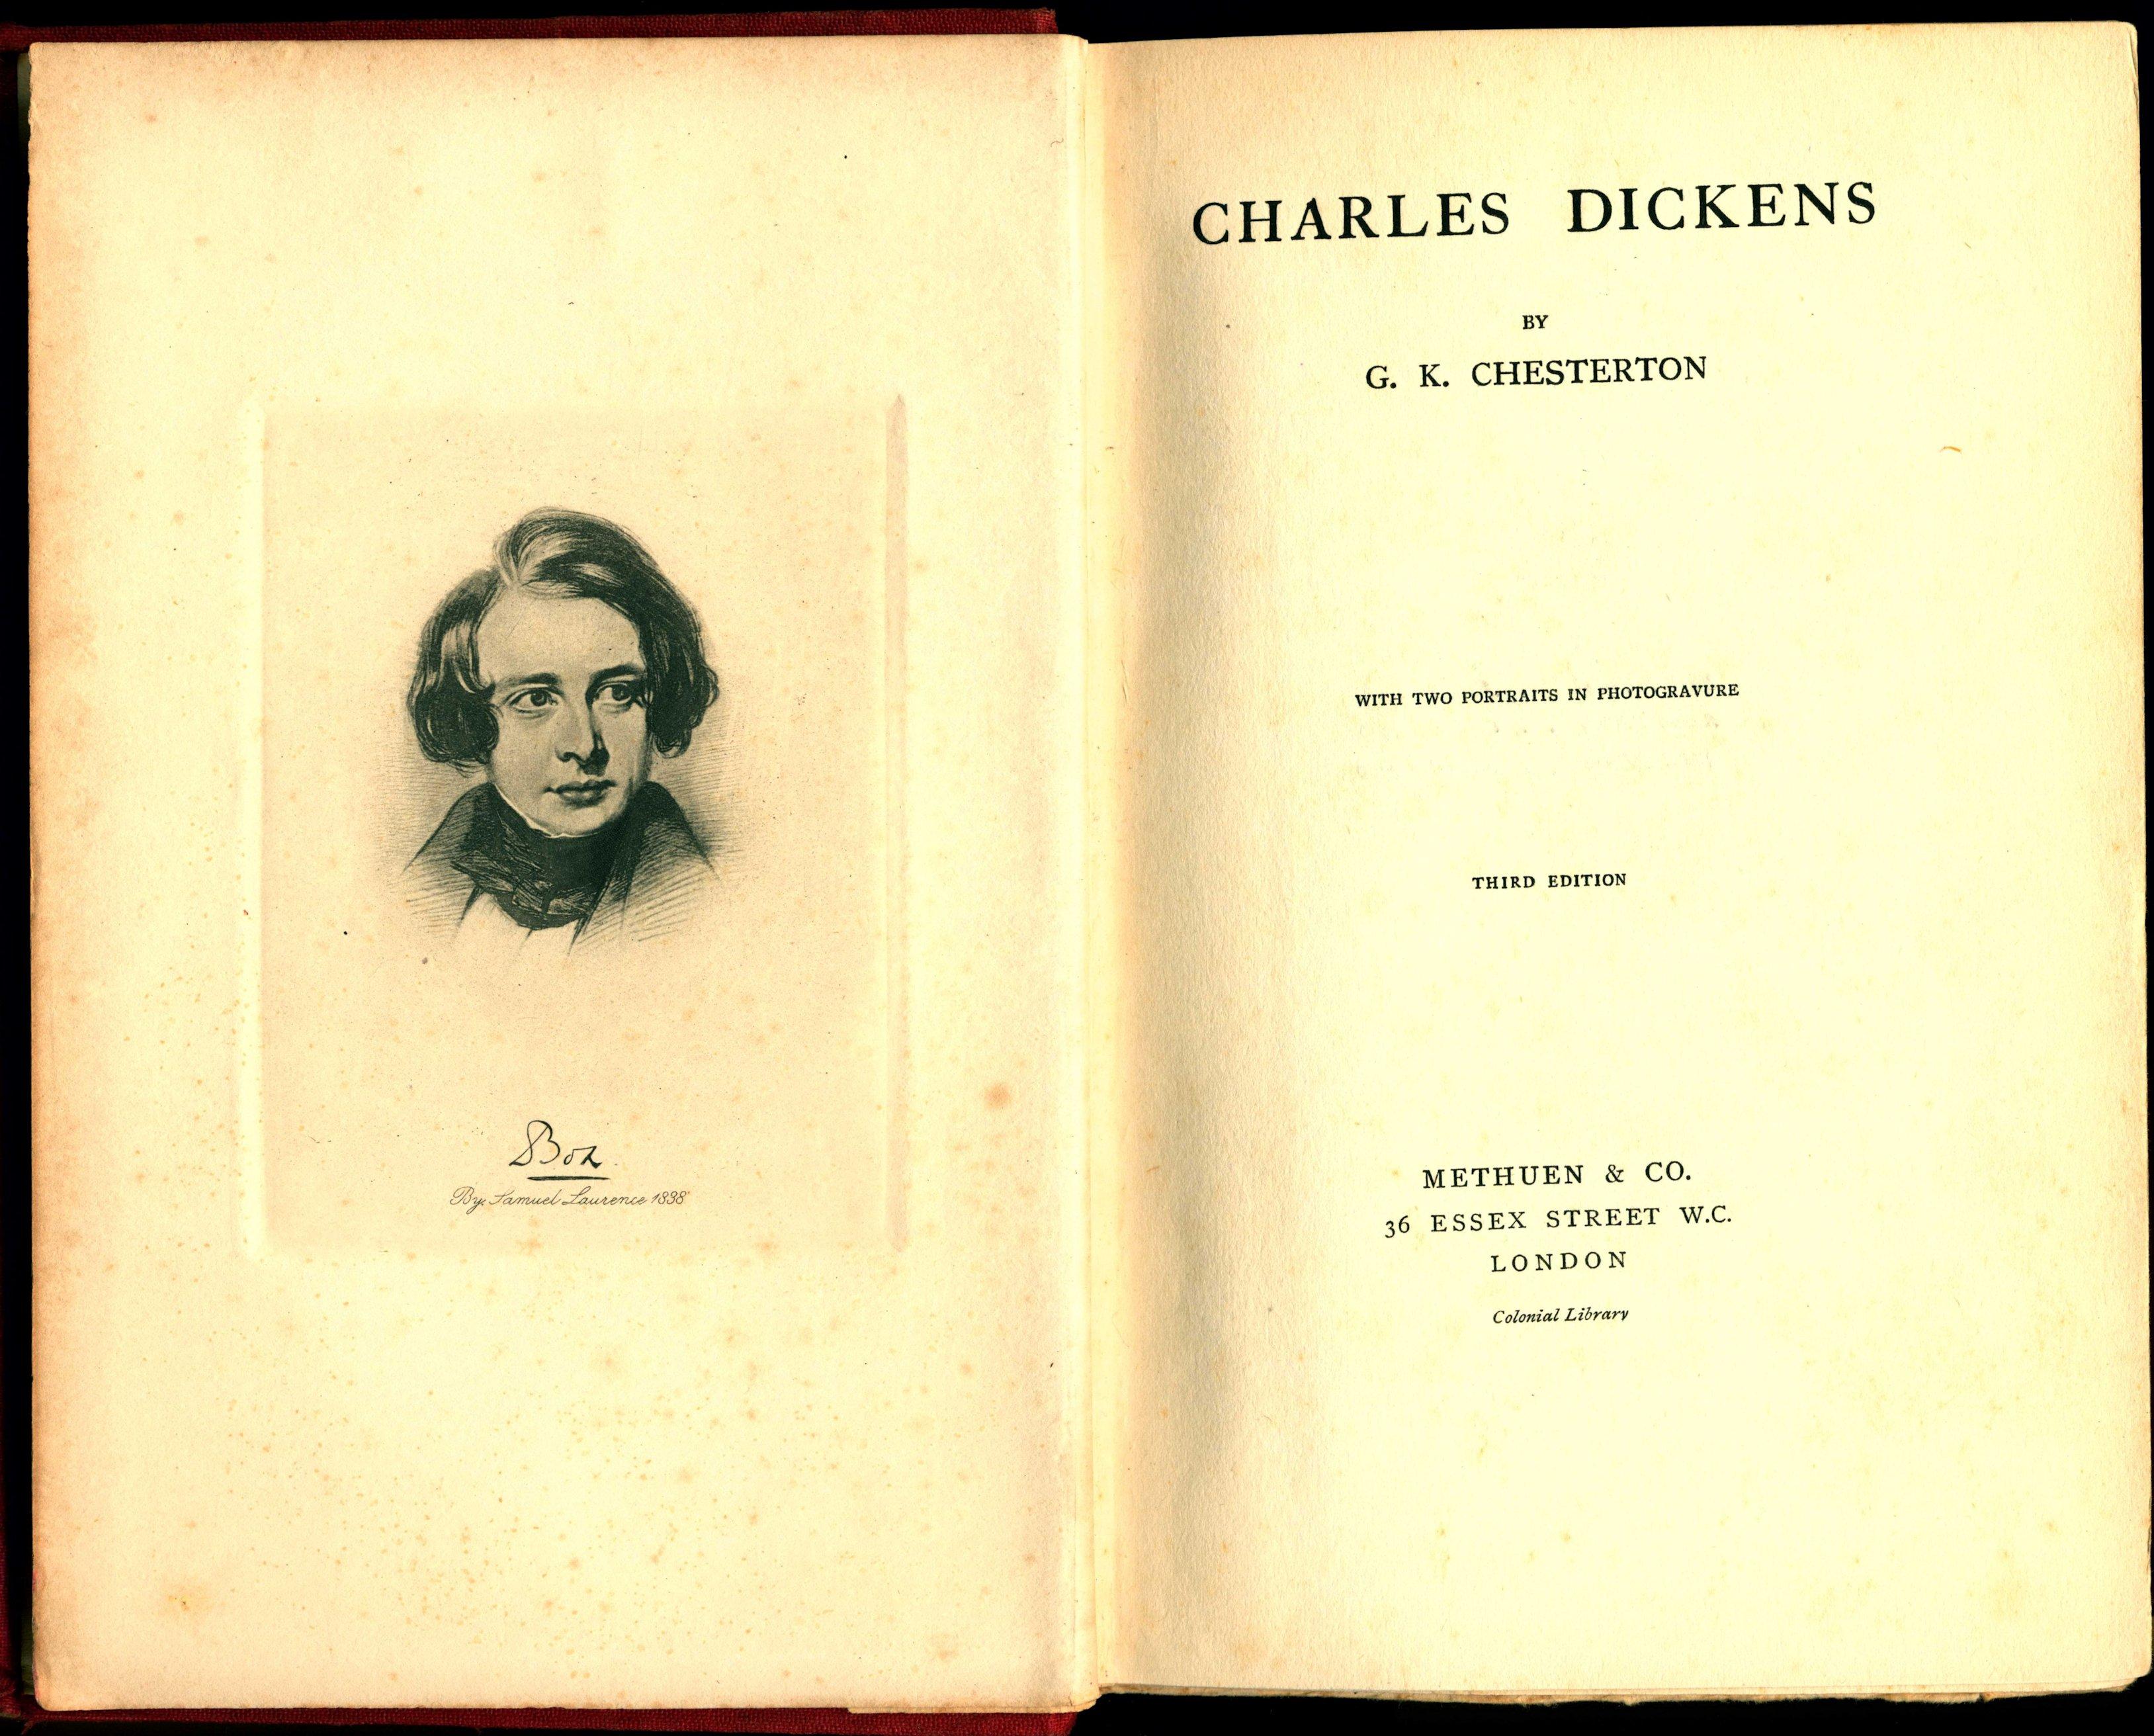 G.K. Chesterton. Charles Dickens. London: Methuen, 1906.